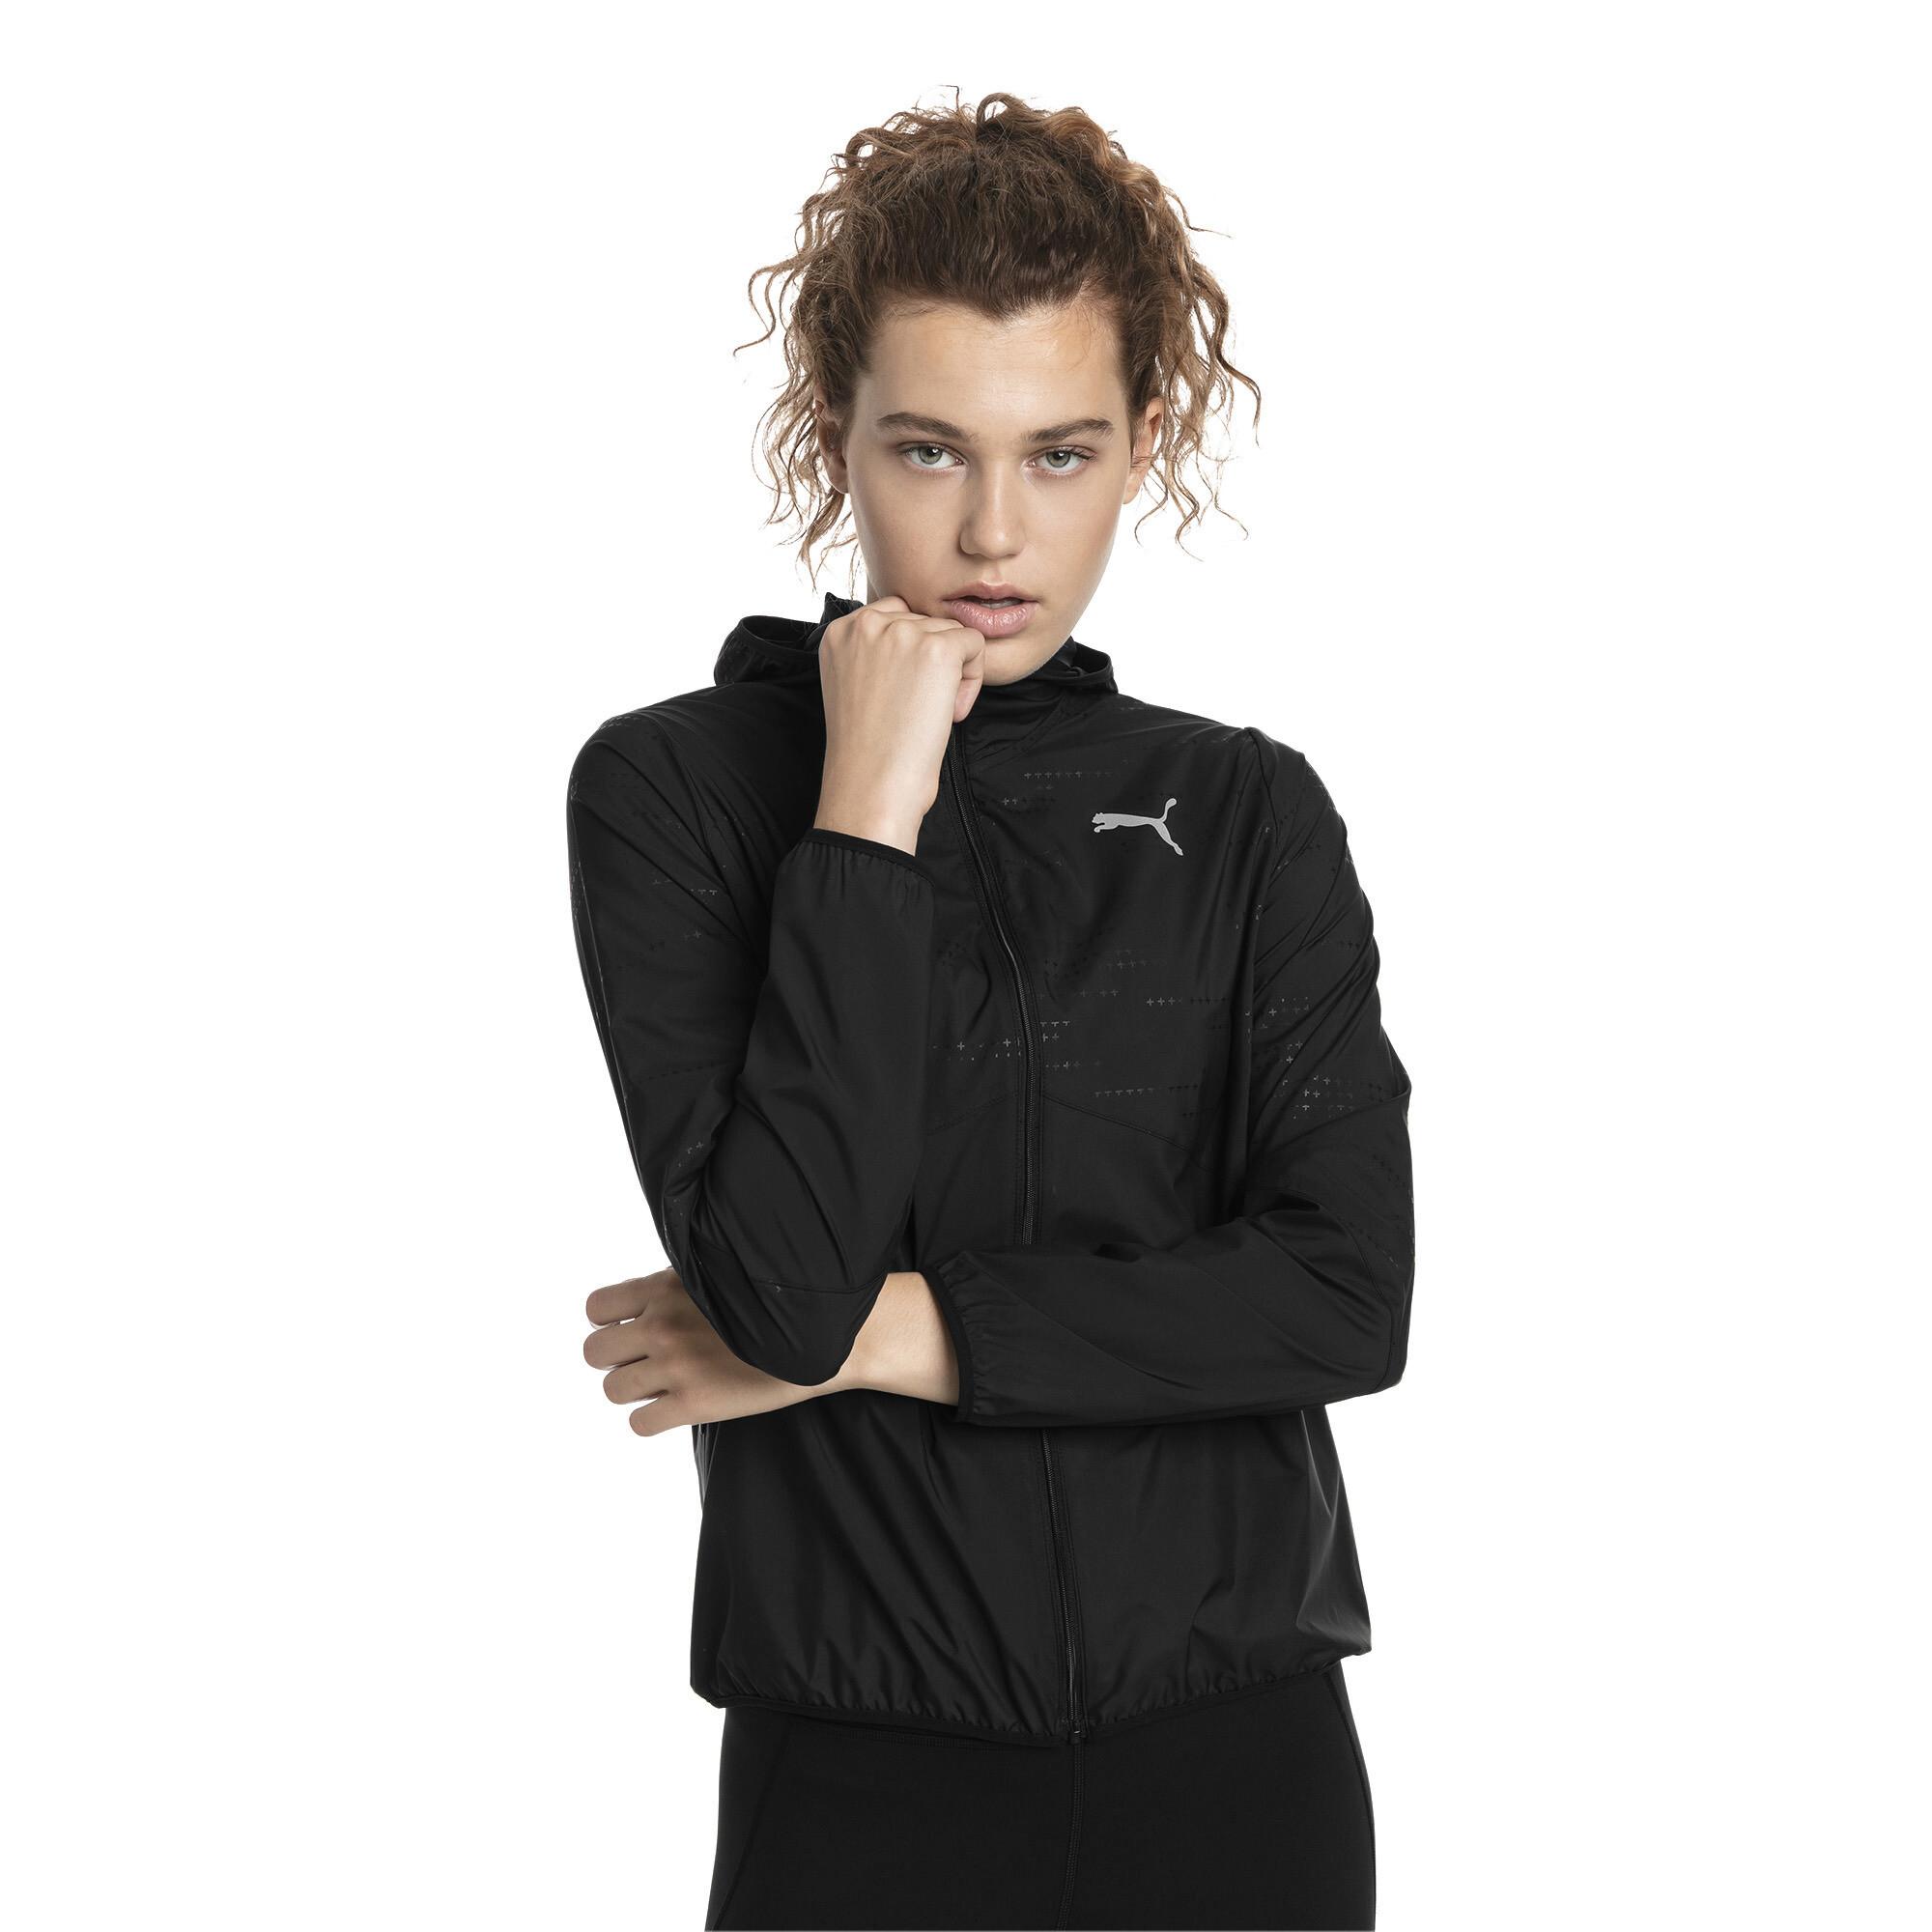 Chaqueta deportiva de malla tejida y capucha Ignite para mujer